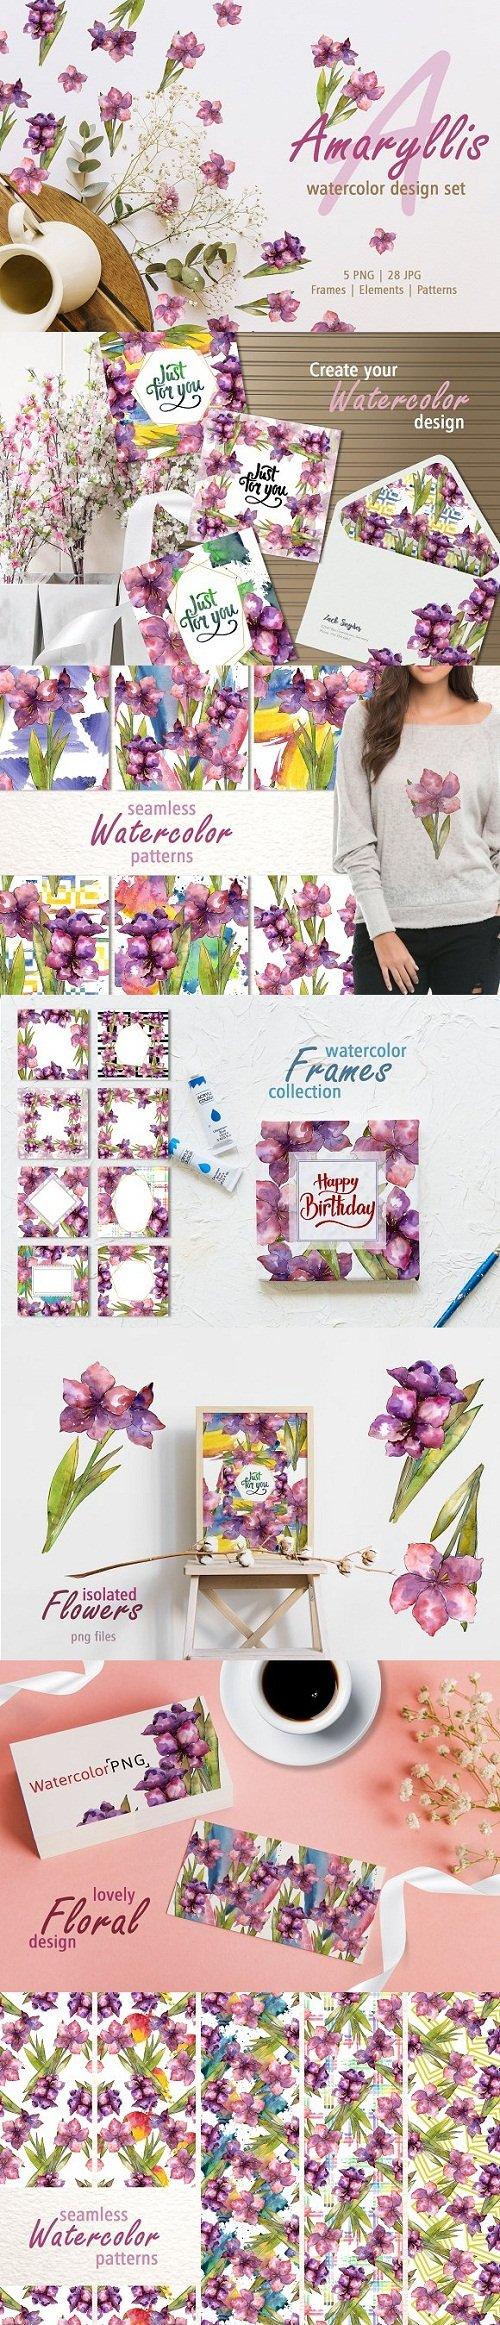 Amaryllis design set Watercolor png - 3415300